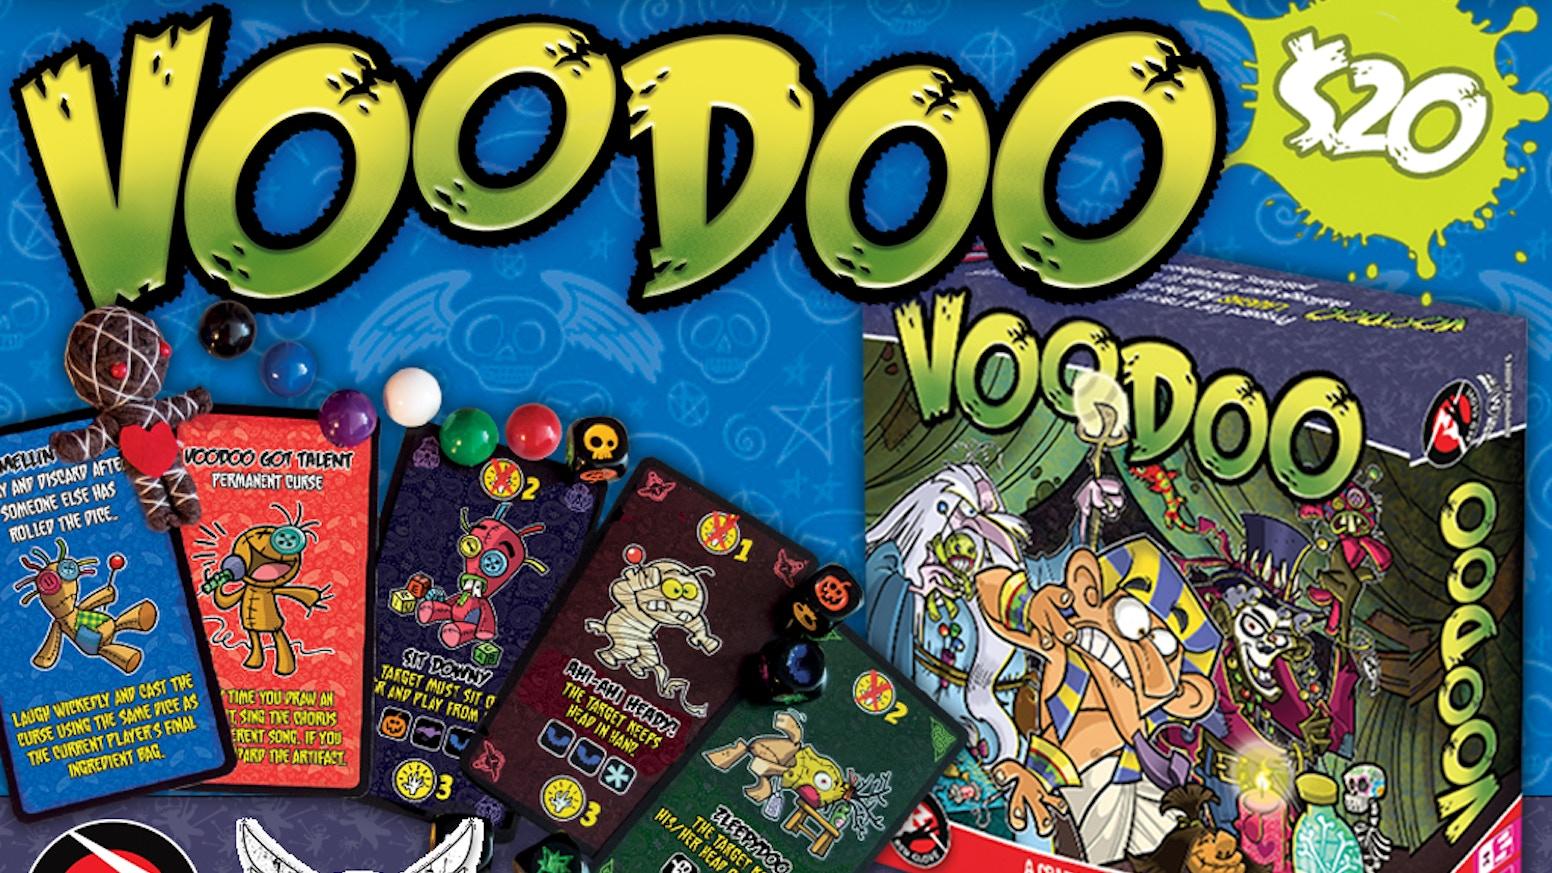 Voodoo 4 hack mod apk und kostenlos cheats generator ohne